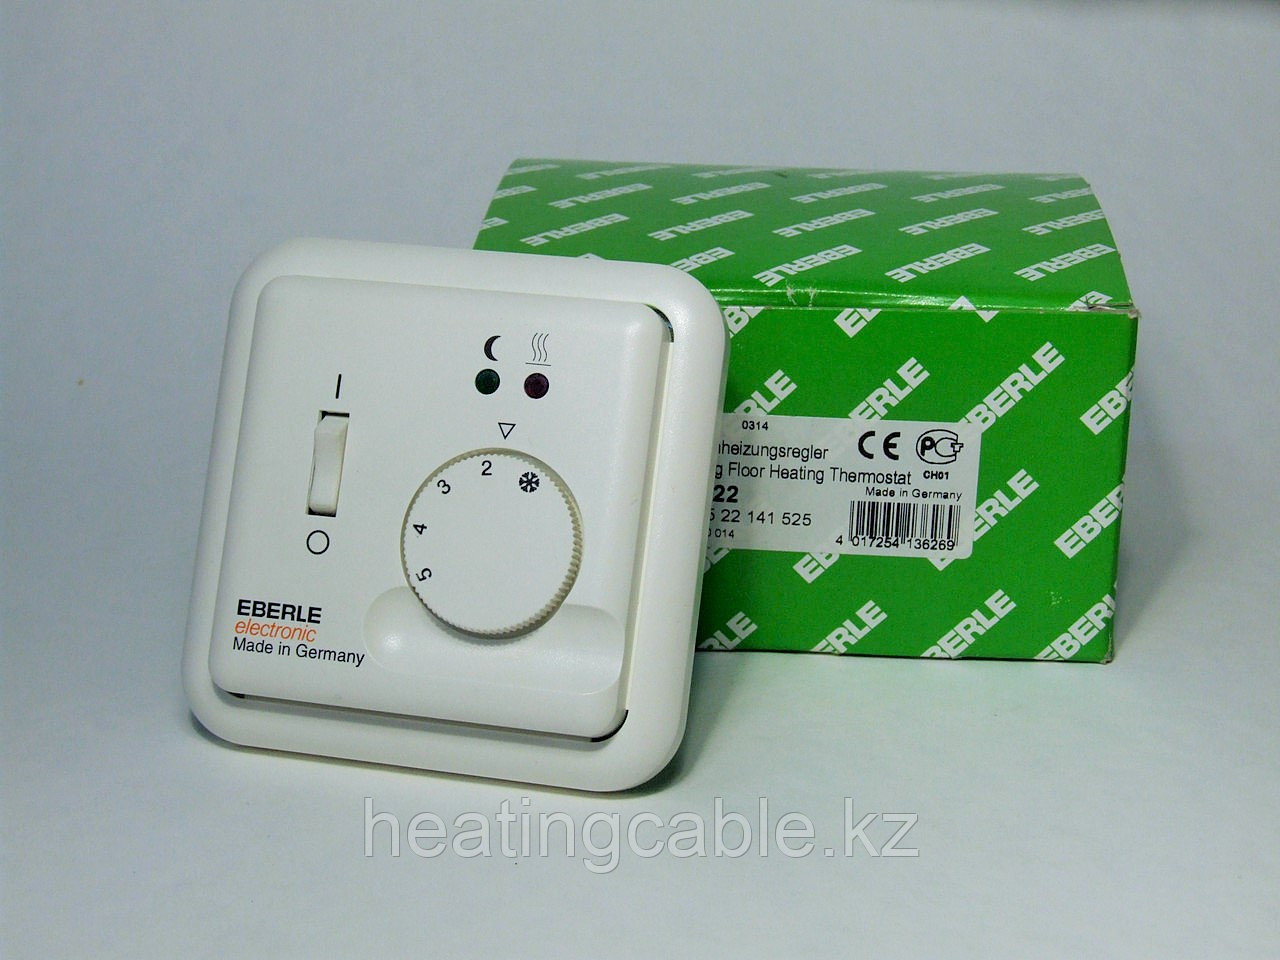 Терморегулятор Eberle fre525 22 (10А)